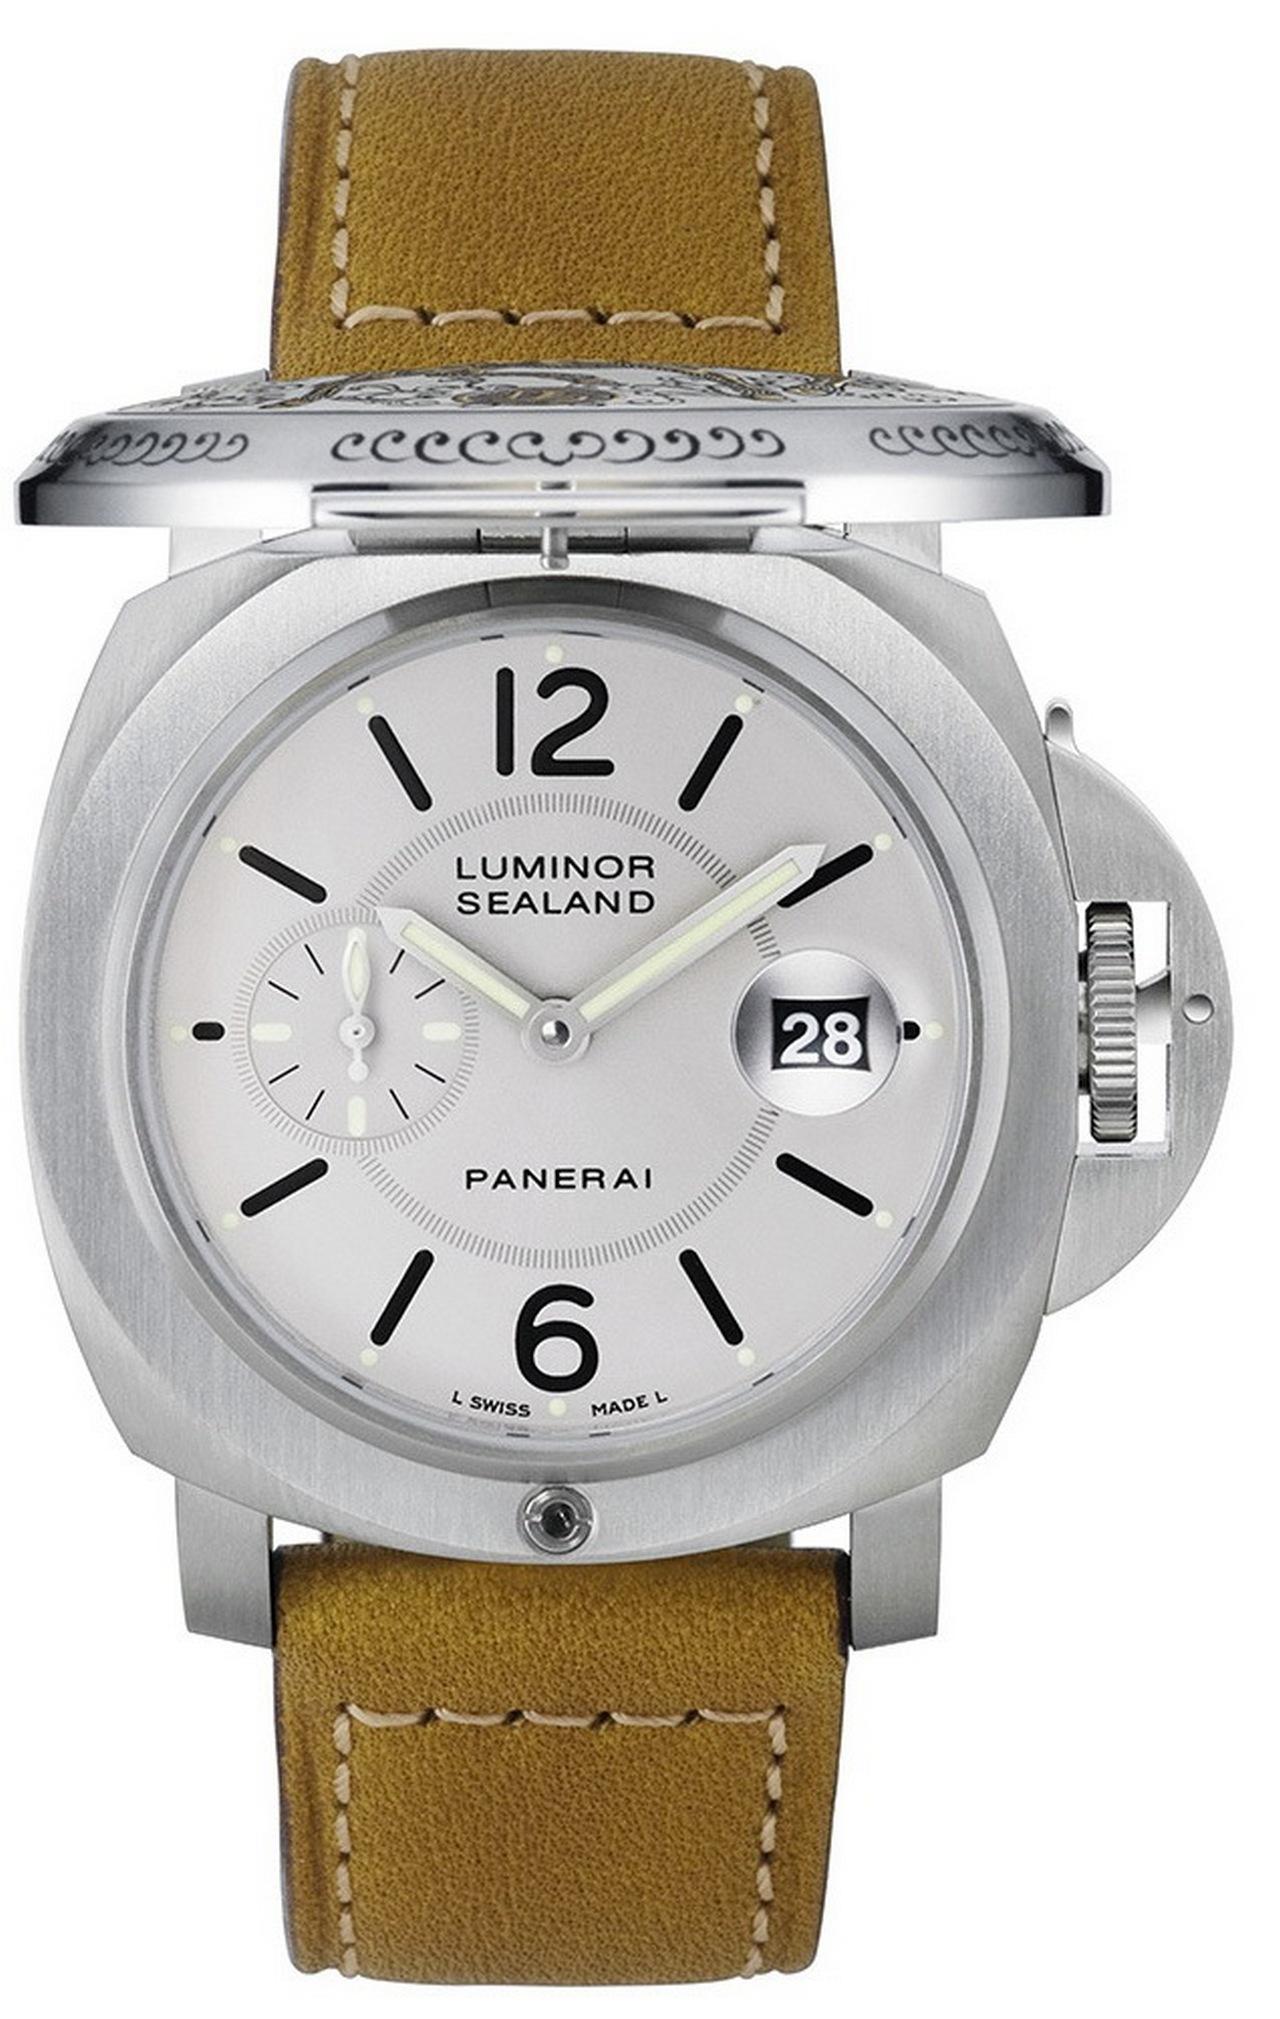 officine-panerai-luminor-sealand-year-of-the-horse_0-100_1